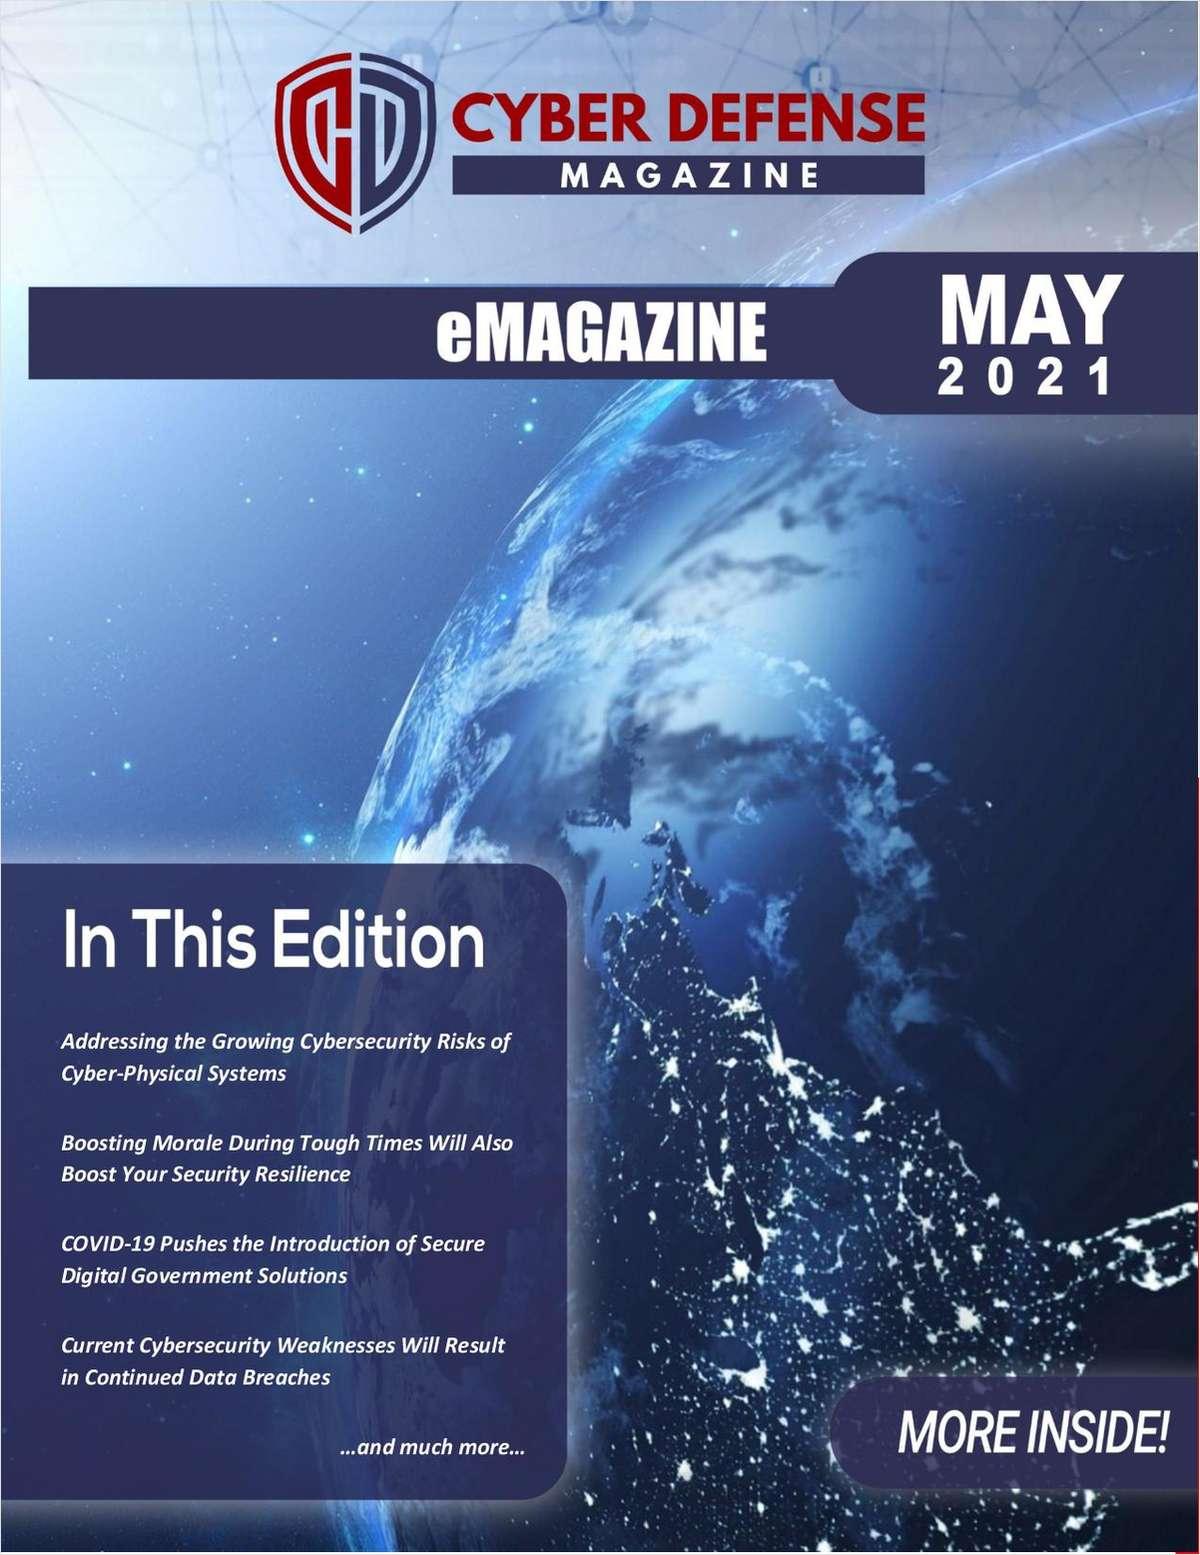 Cyber Defense Magazine May 2021 Edition